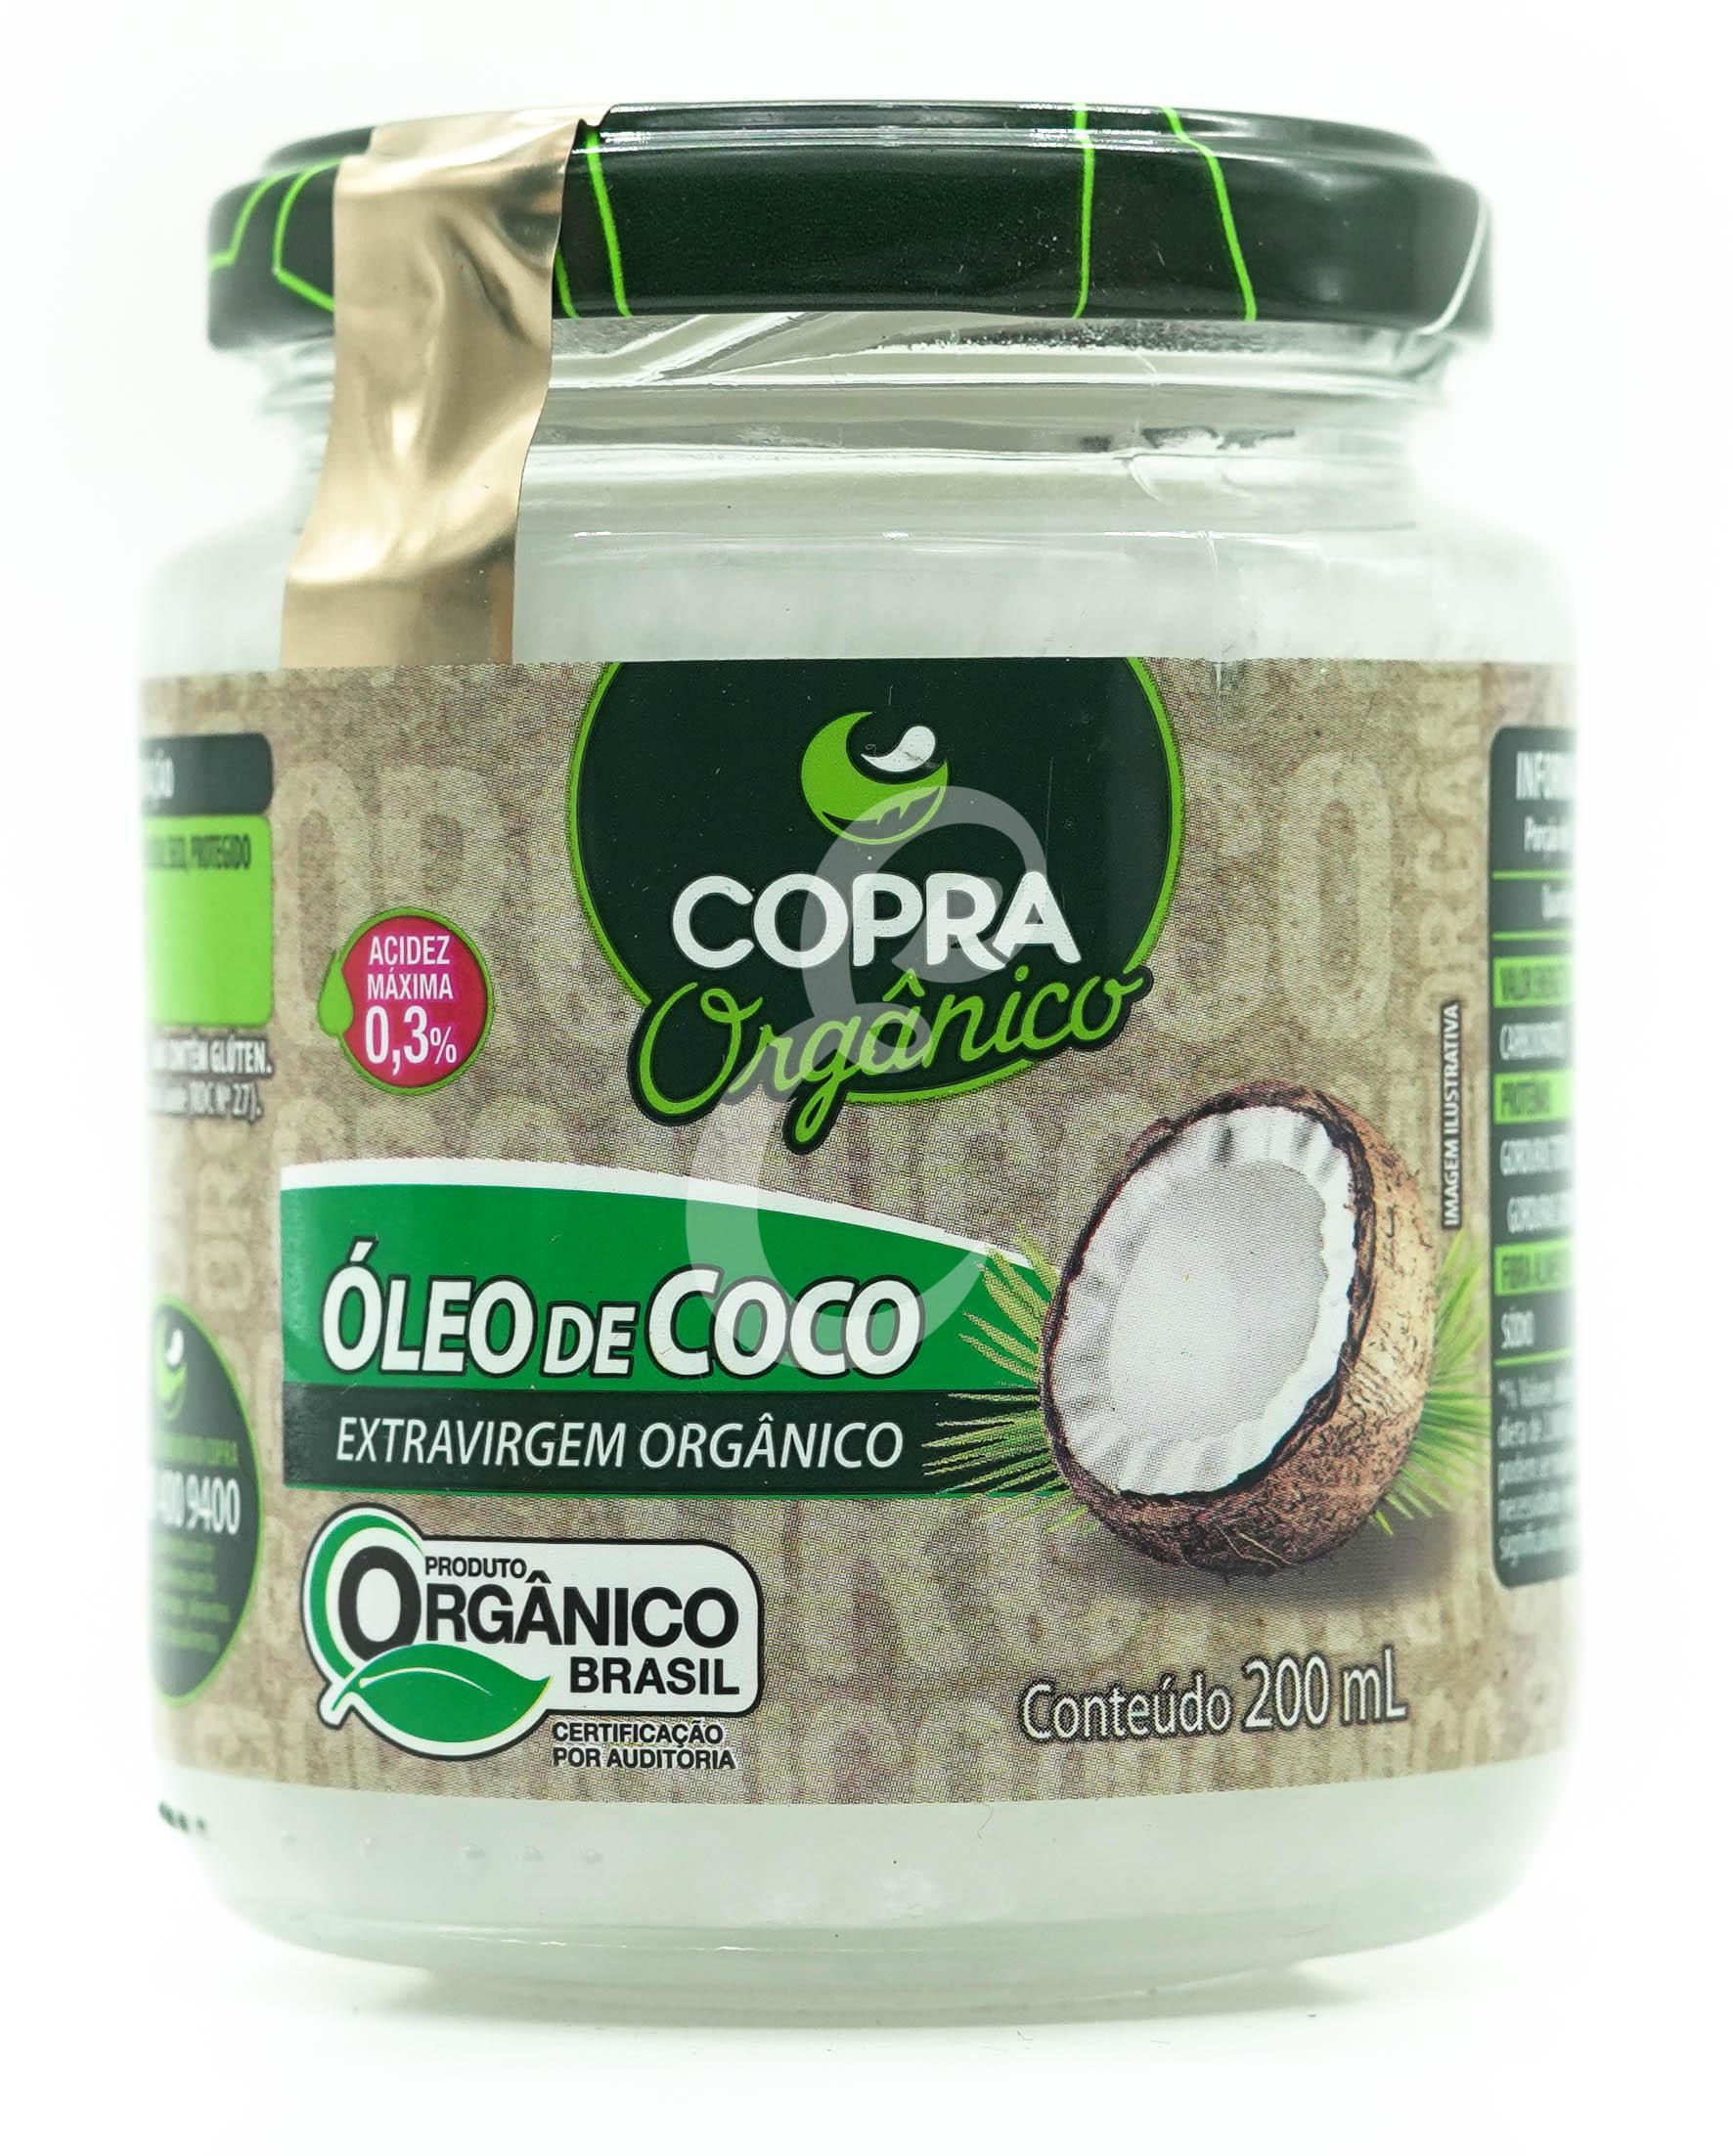 OLEO DE COCO 200ML EXTRA VIRGEM ORGANICO COPRA